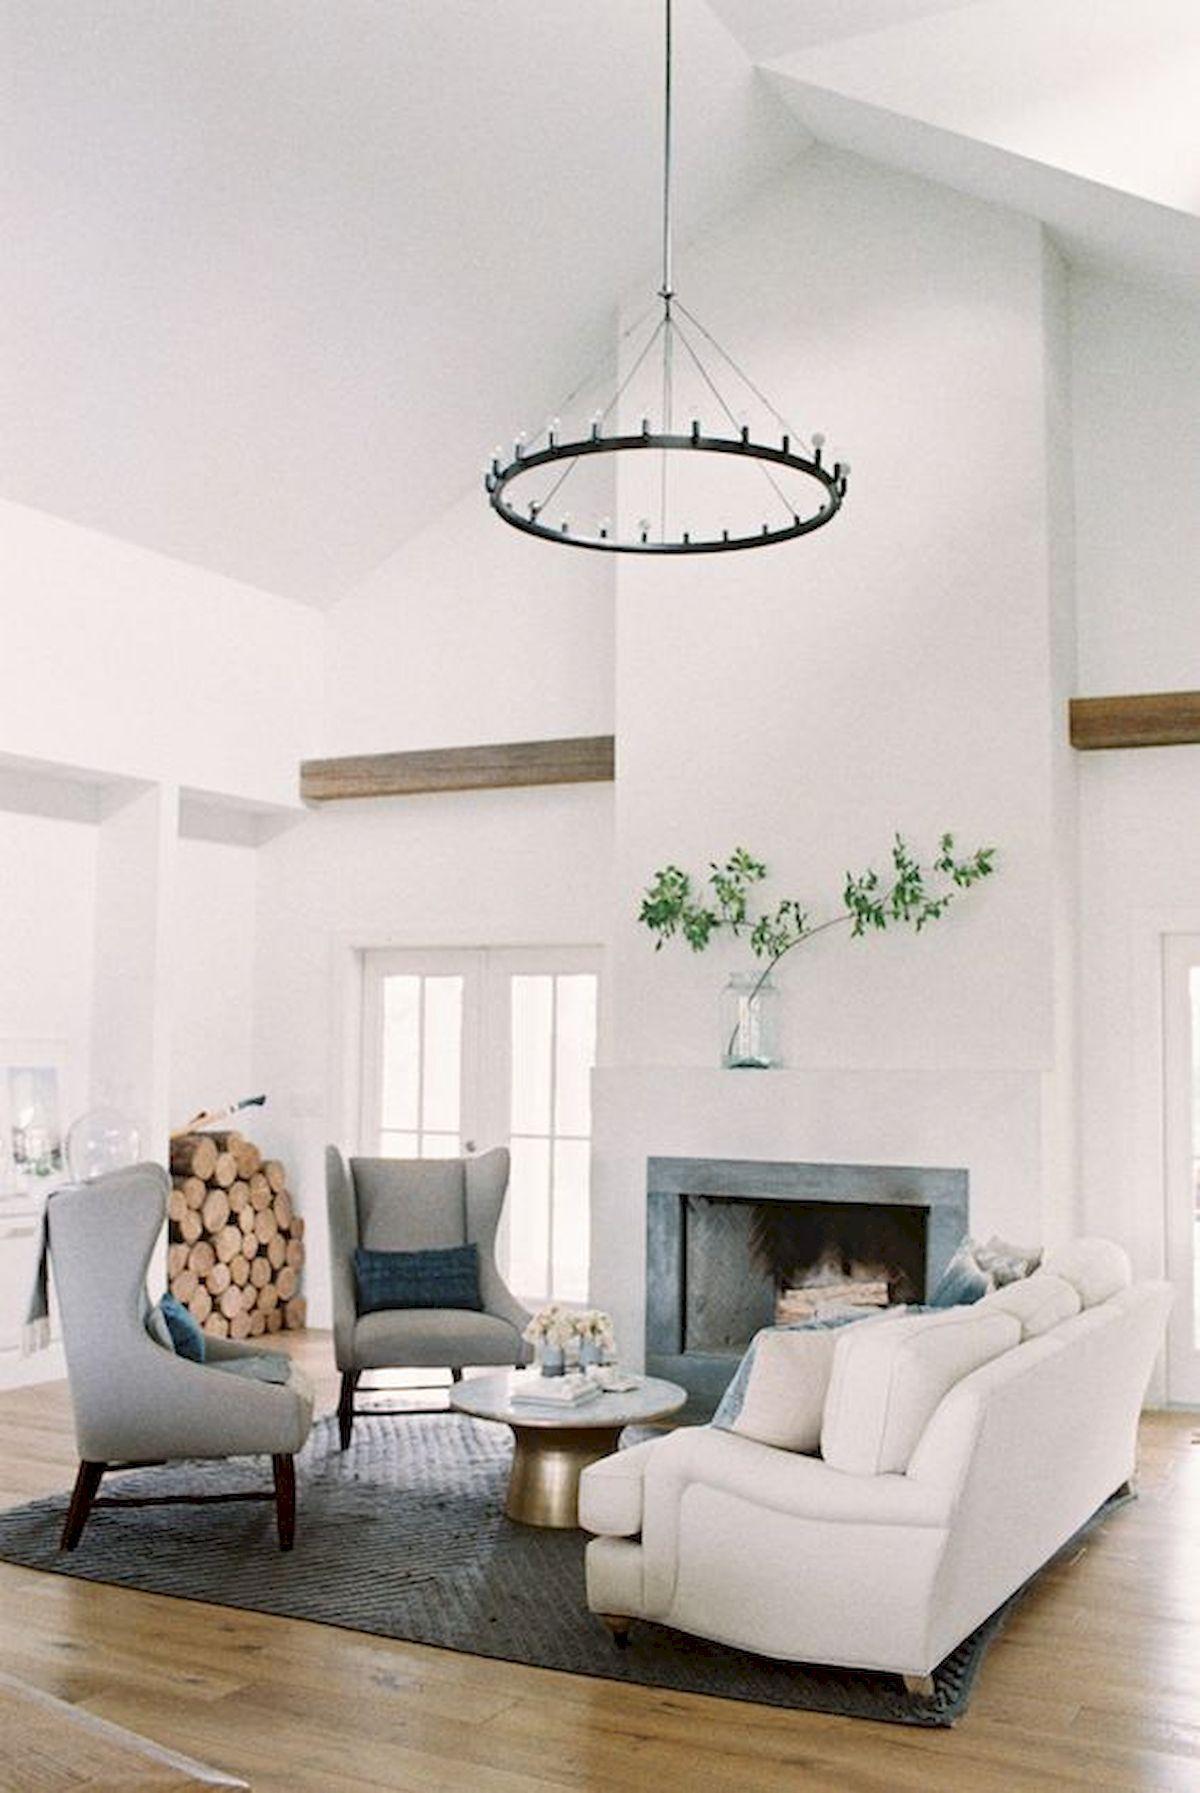 70 elegant modern farmhouse living room decor ideas and makeover rh pinterest com